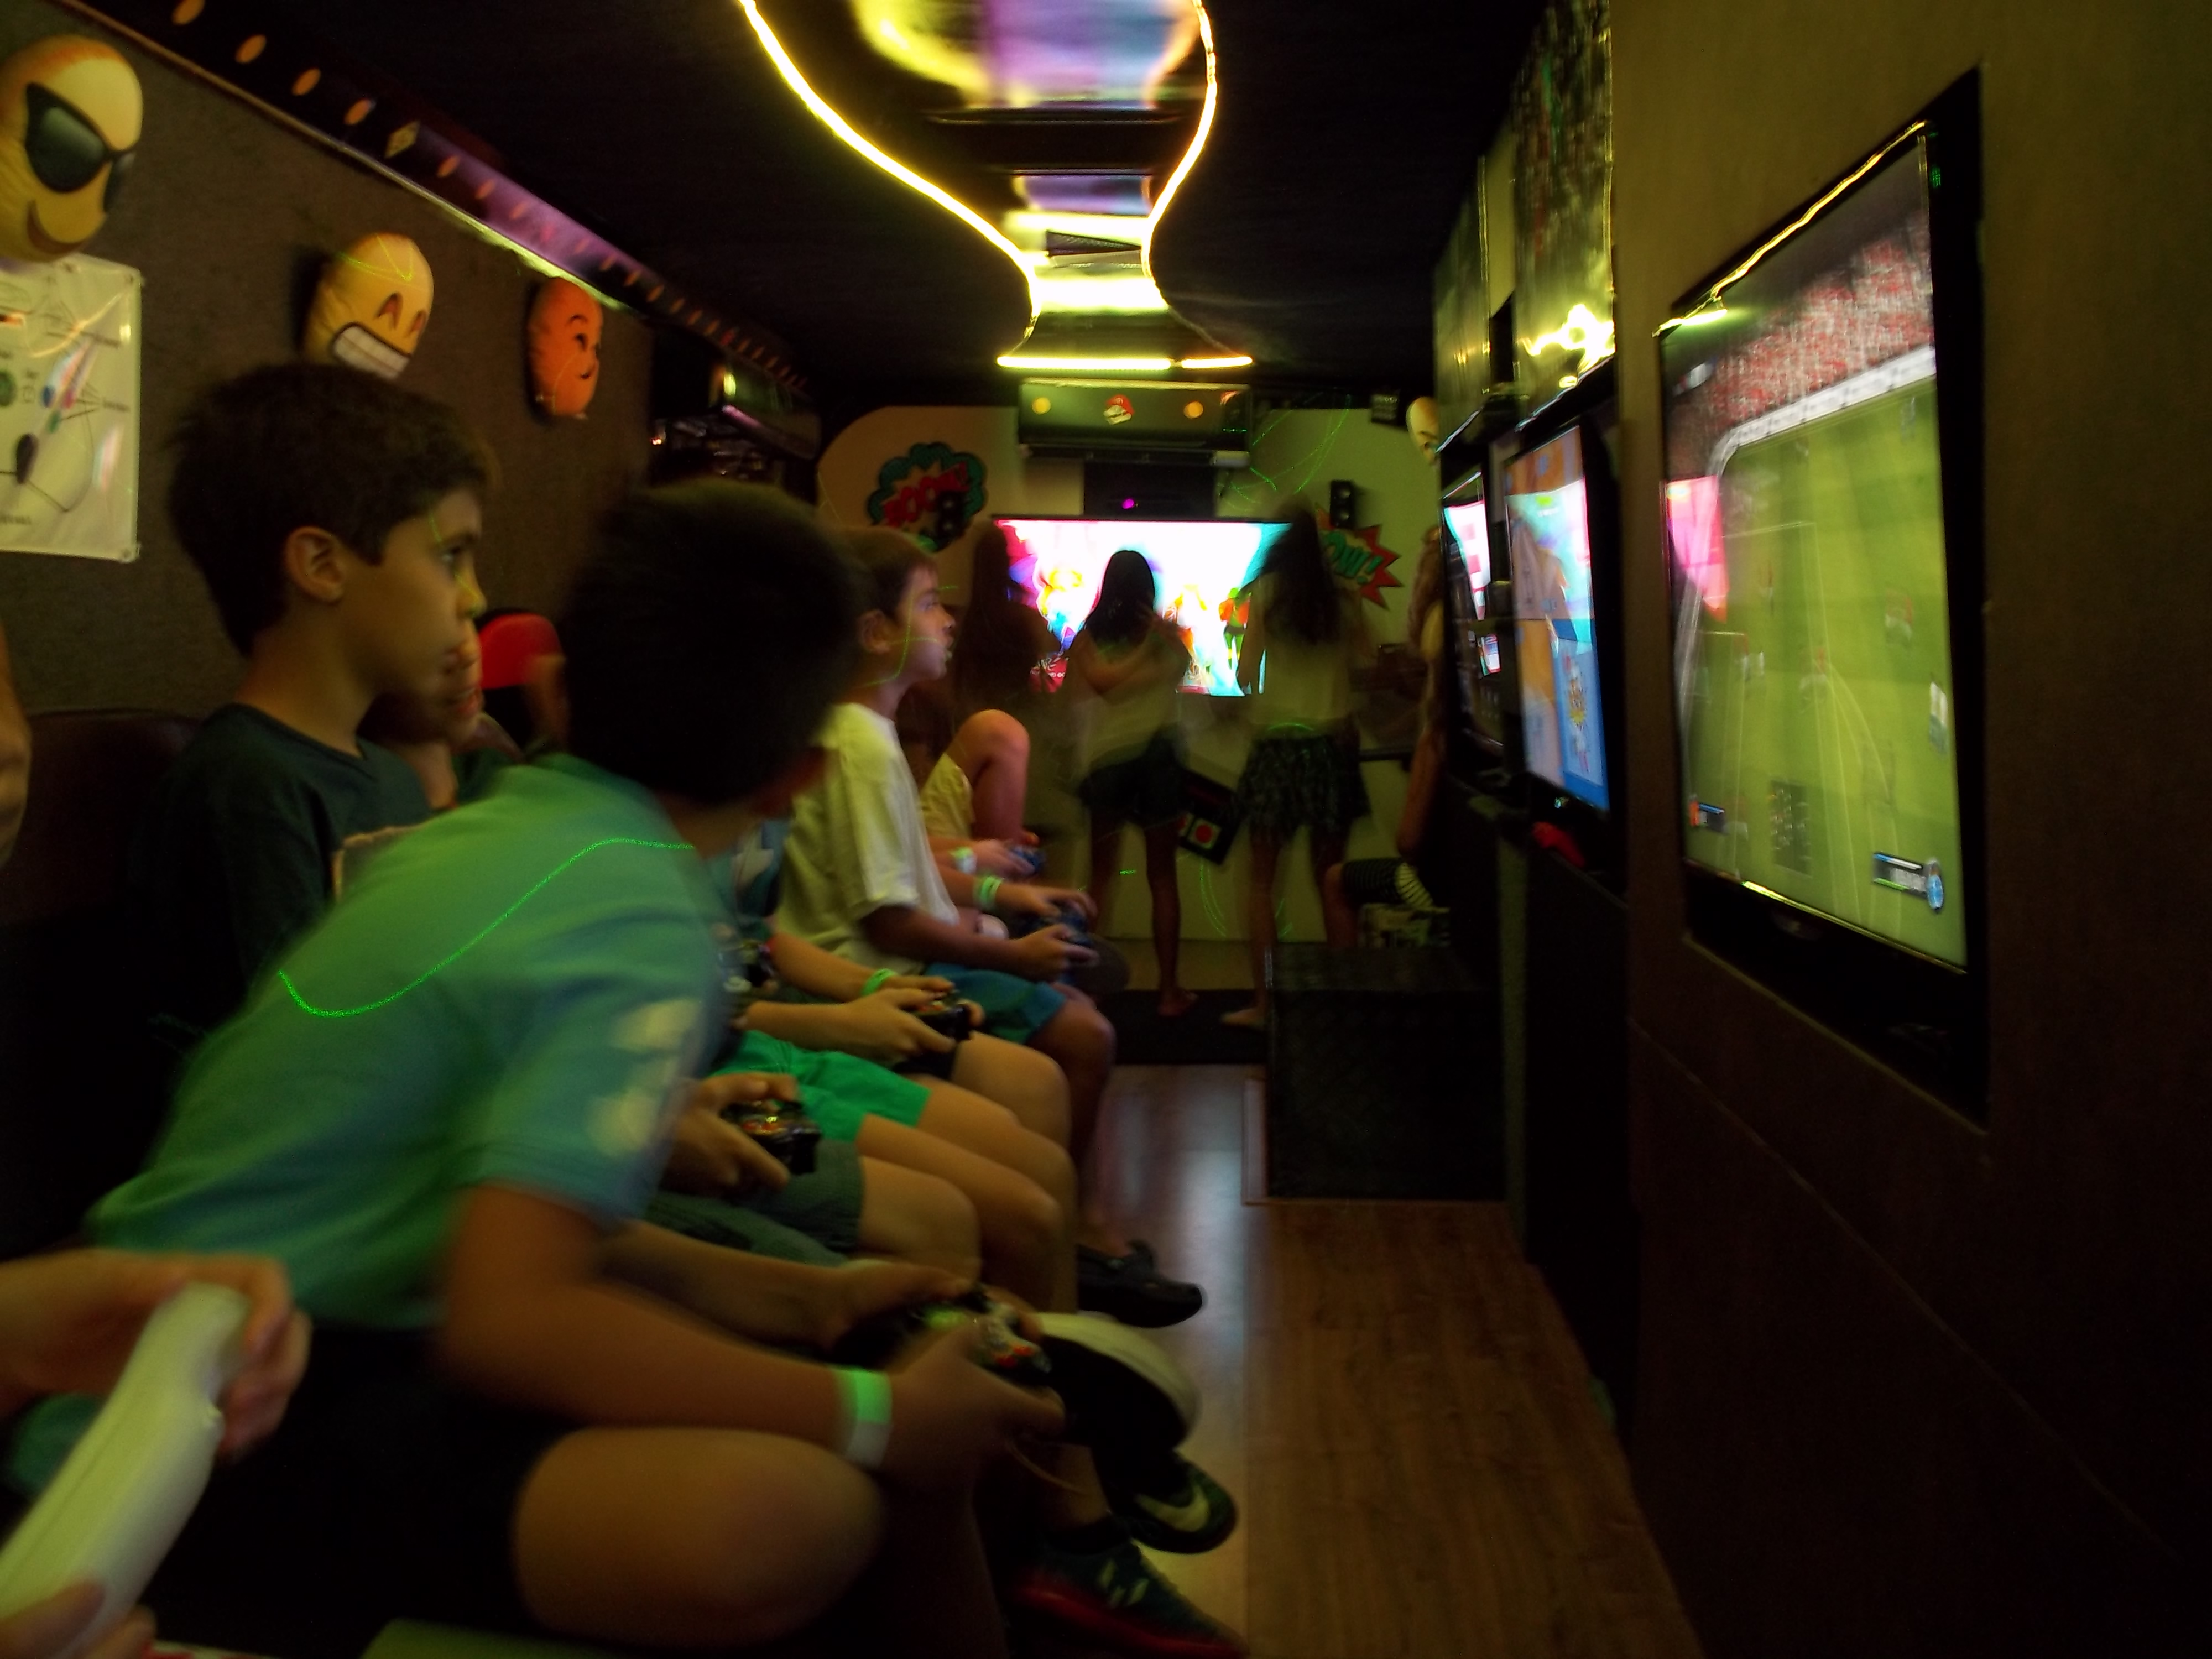 Meninos e meninas jogando videogame